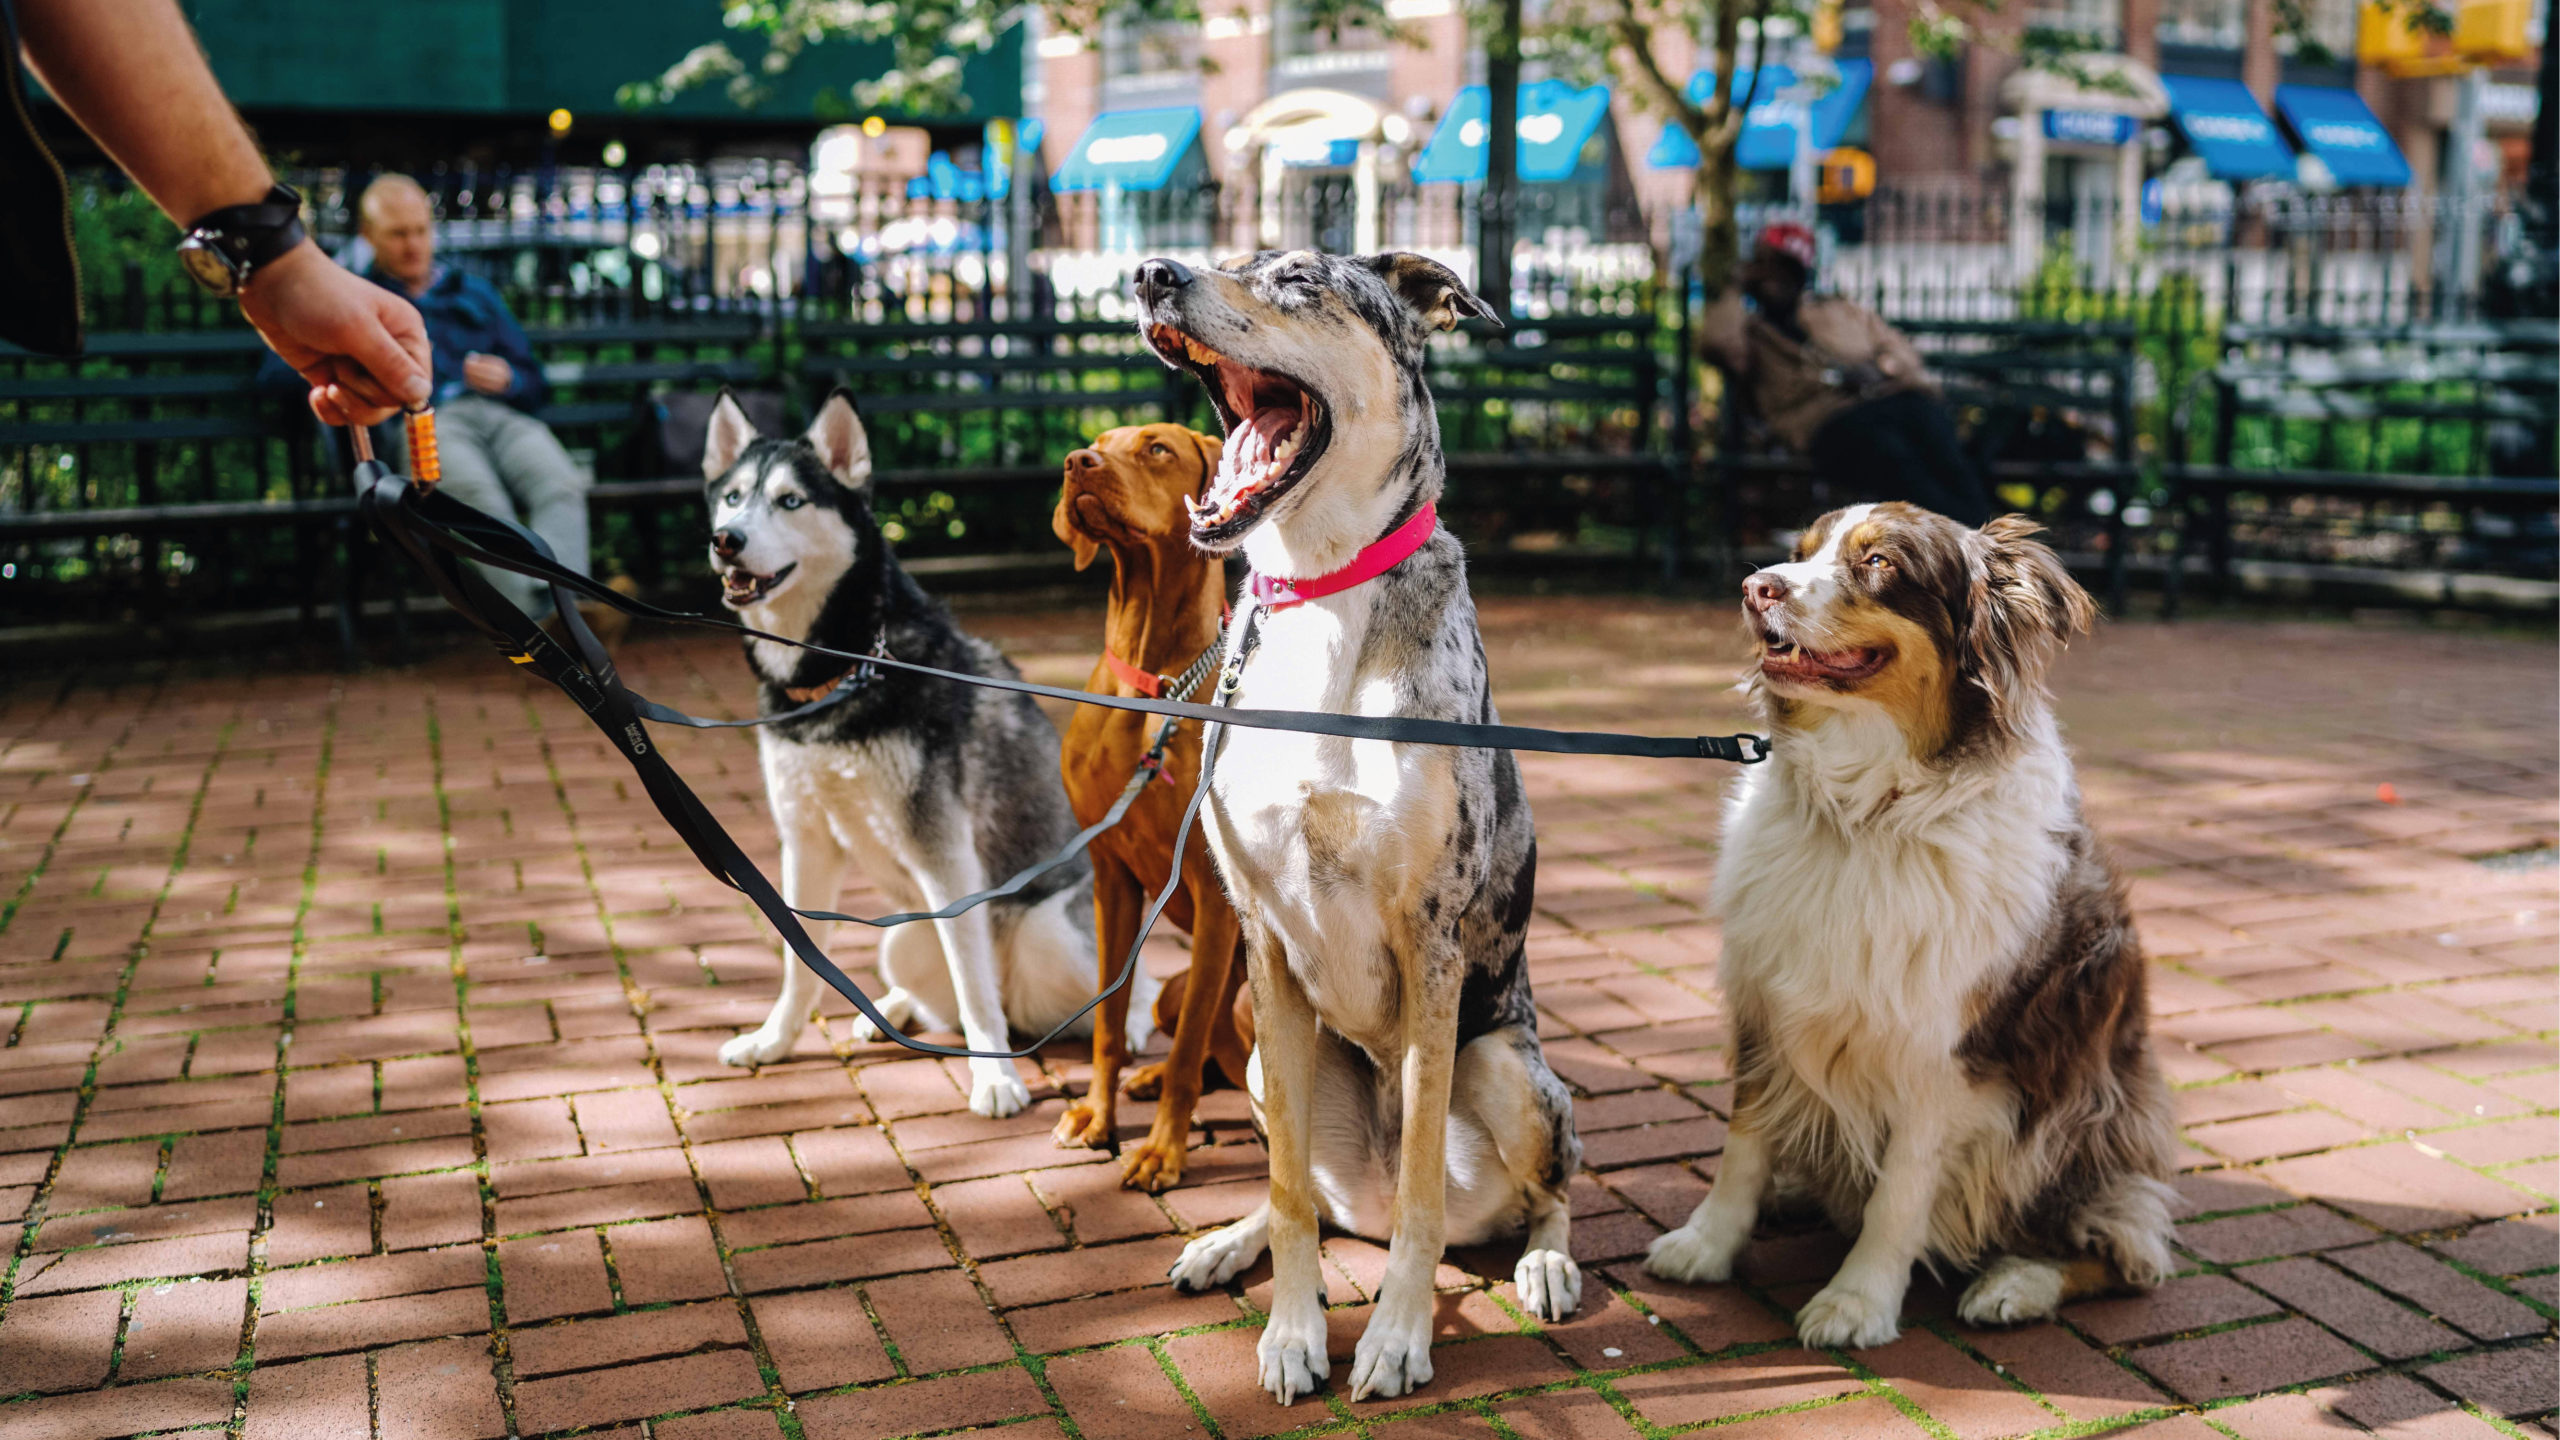 Corea del Sur sugiere prohibir consumo de carne de perro